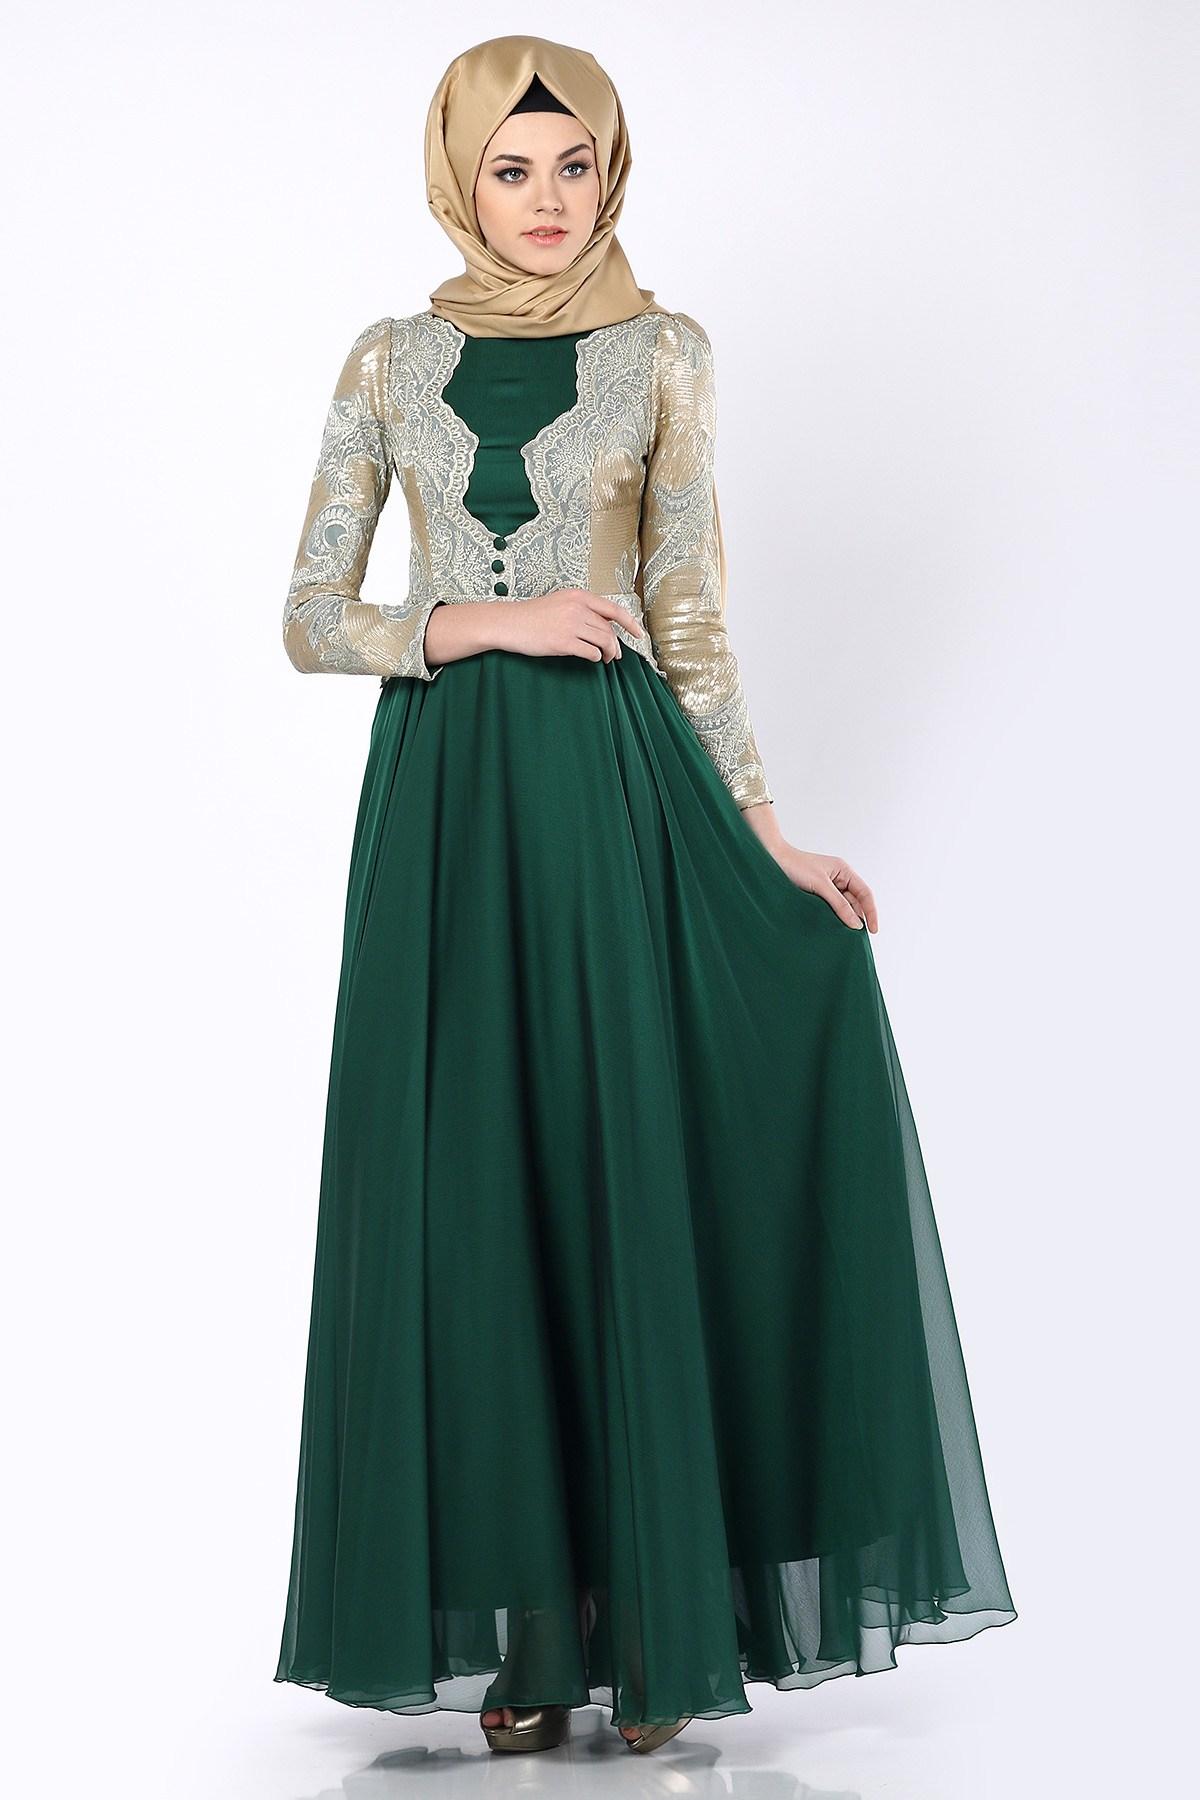 بالصور صور فساتين تركي , اجمل موديلات الفساتين التركي 1839 4